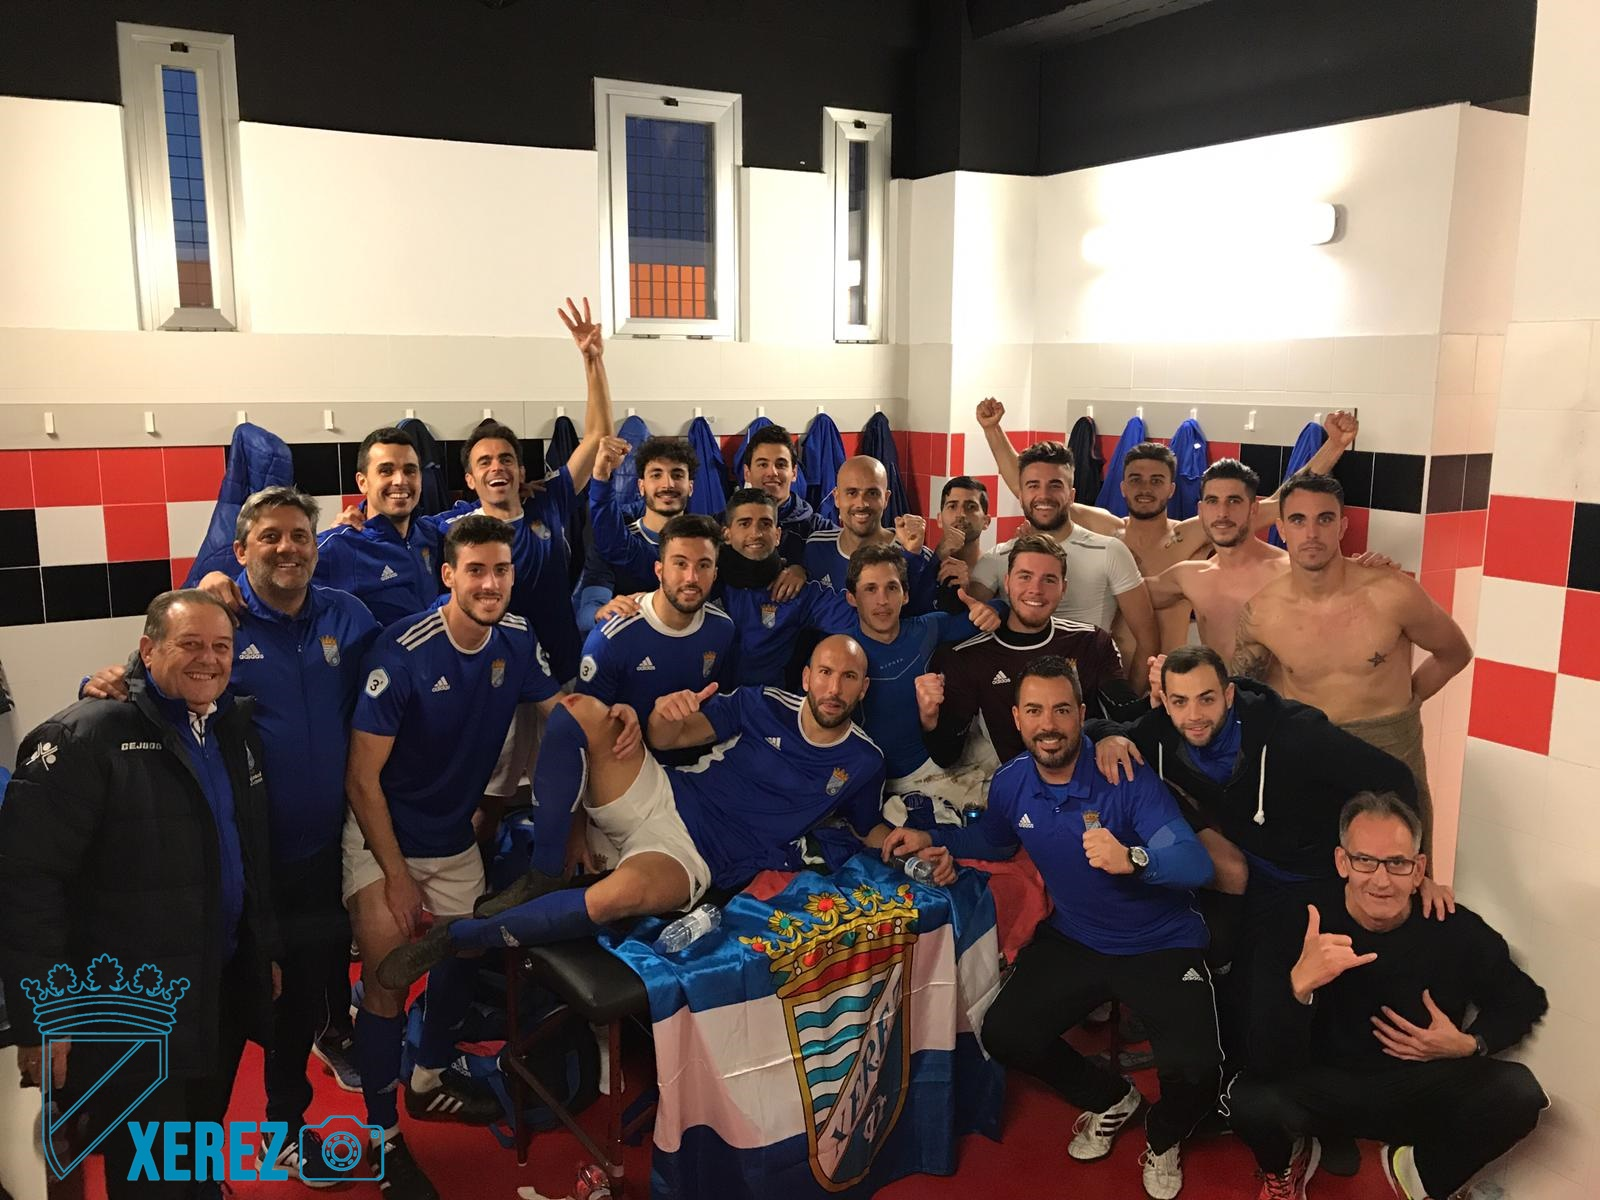 http://www.xerezclubdeportivo.es/wp-content/uploads/2019/01/WhatsApp-Image-2019-01-07-at-18.49.39.jpeg